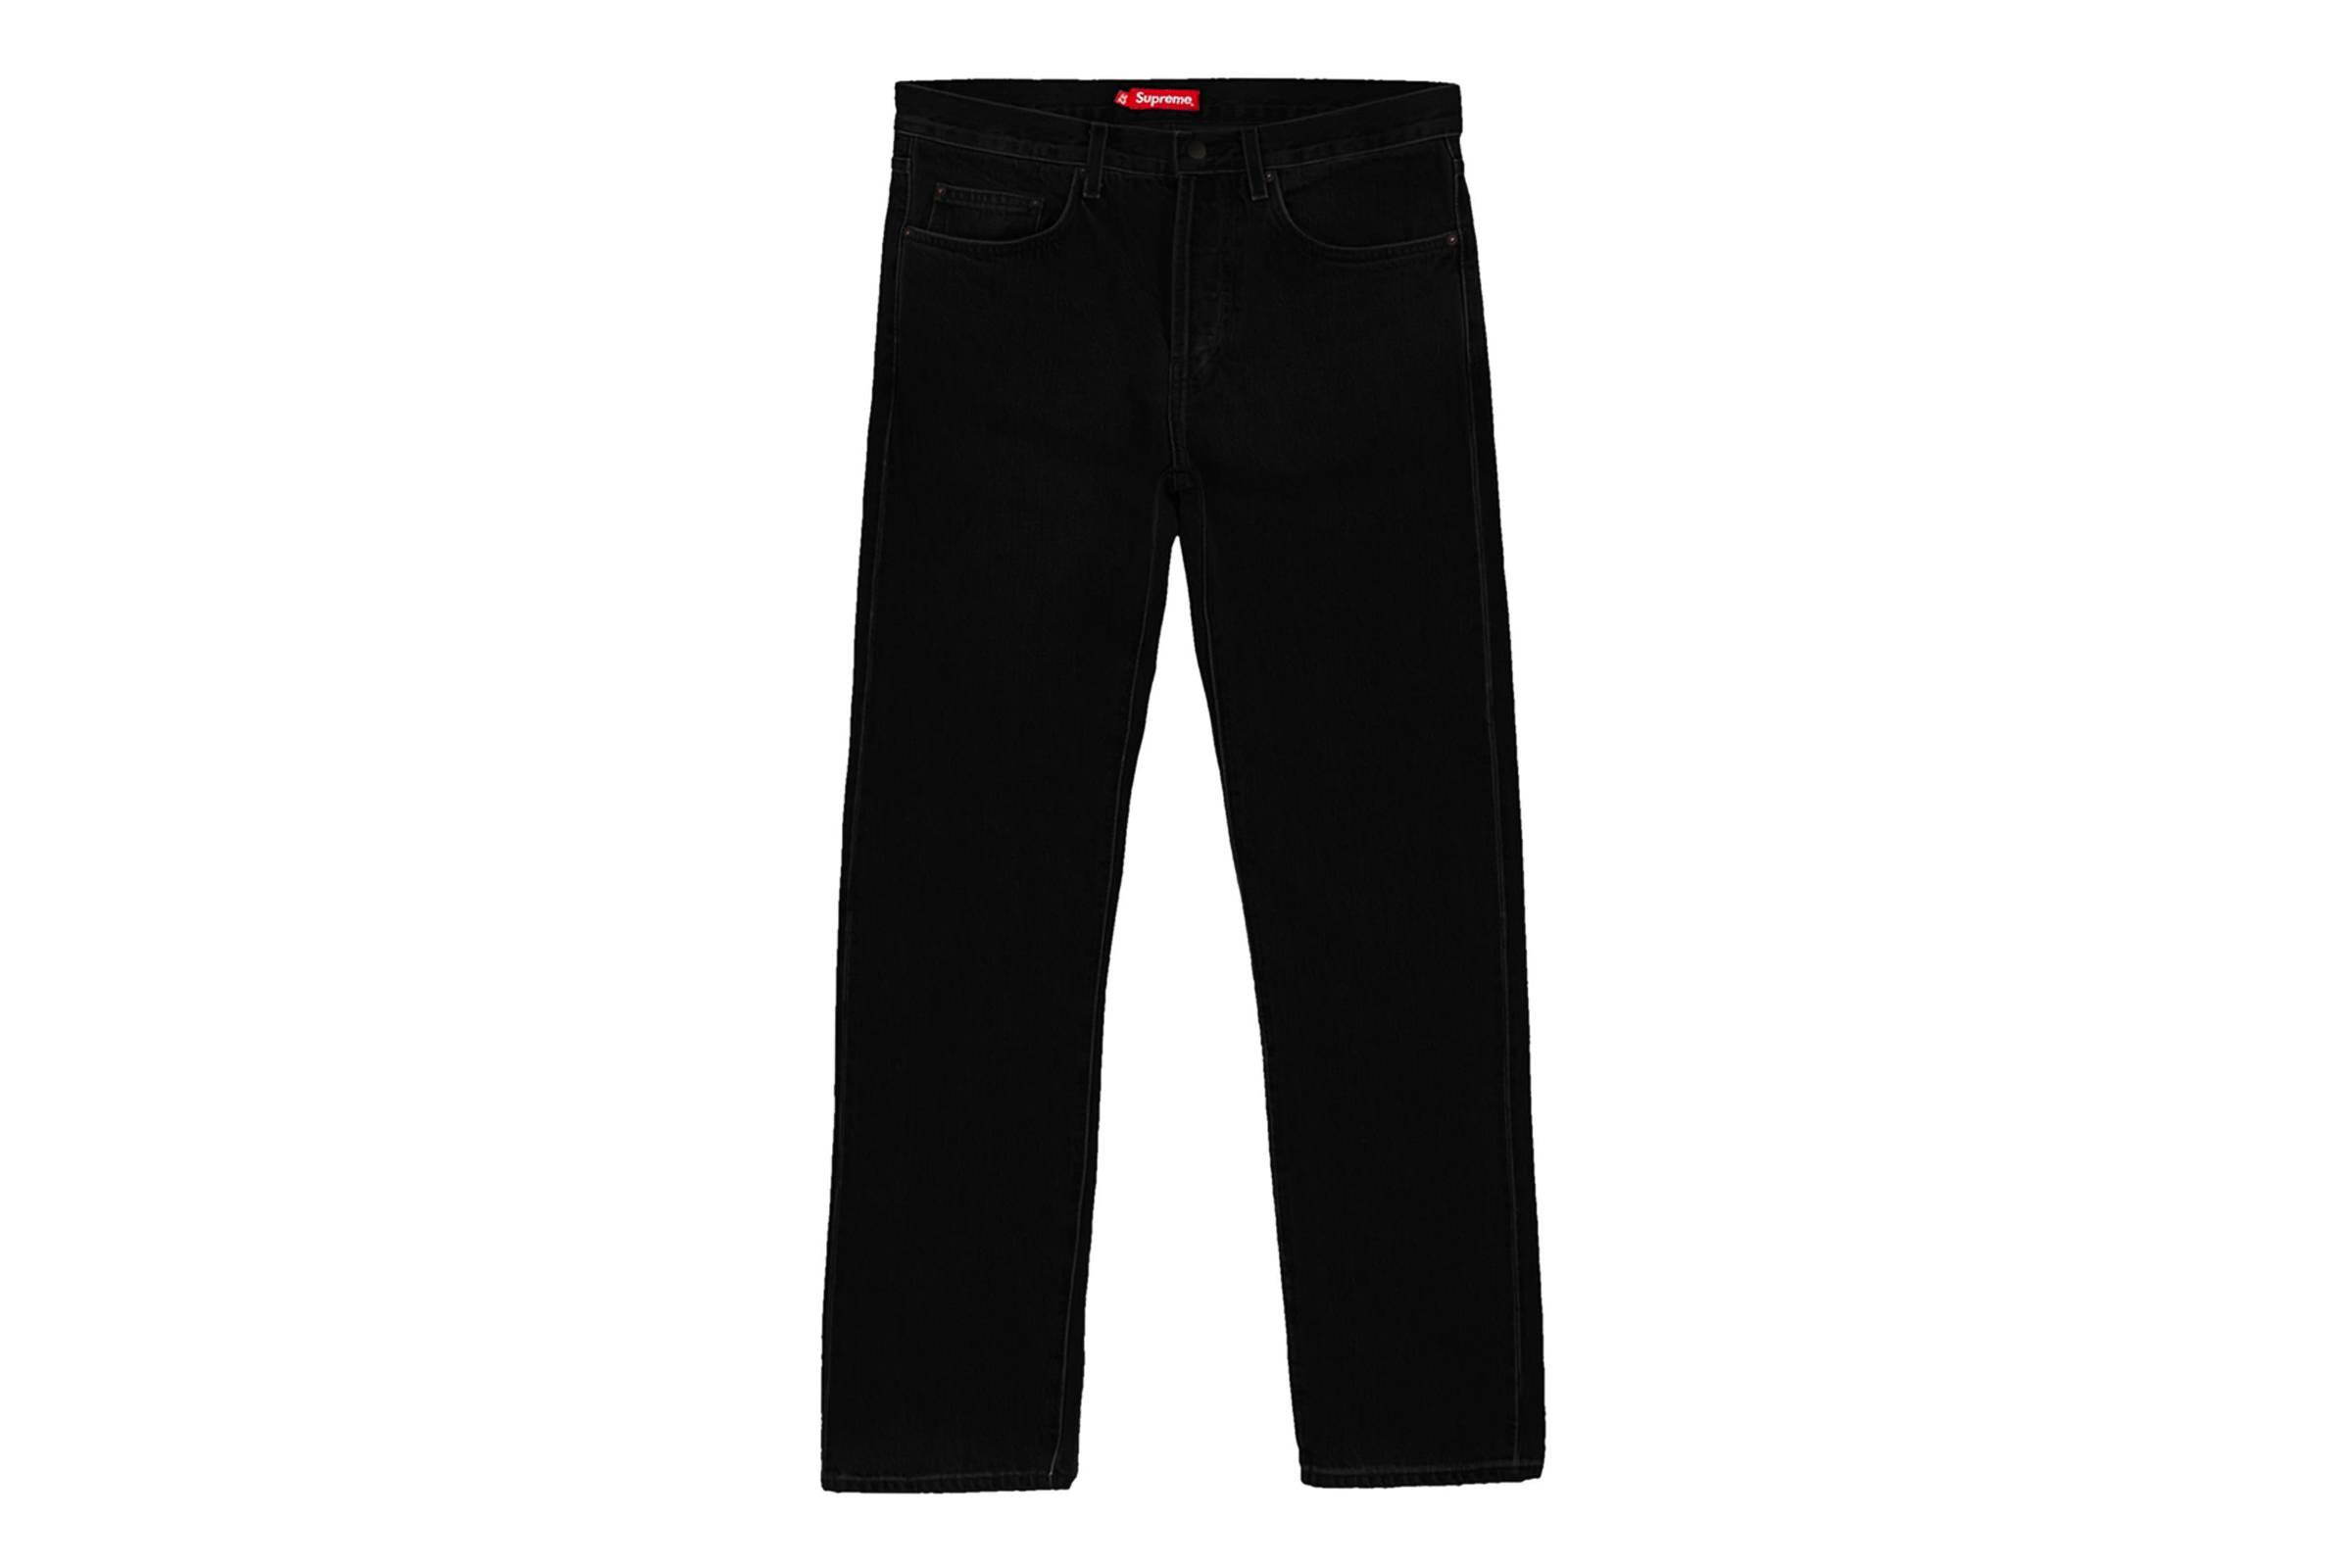 Supreme Slim Fit Jean